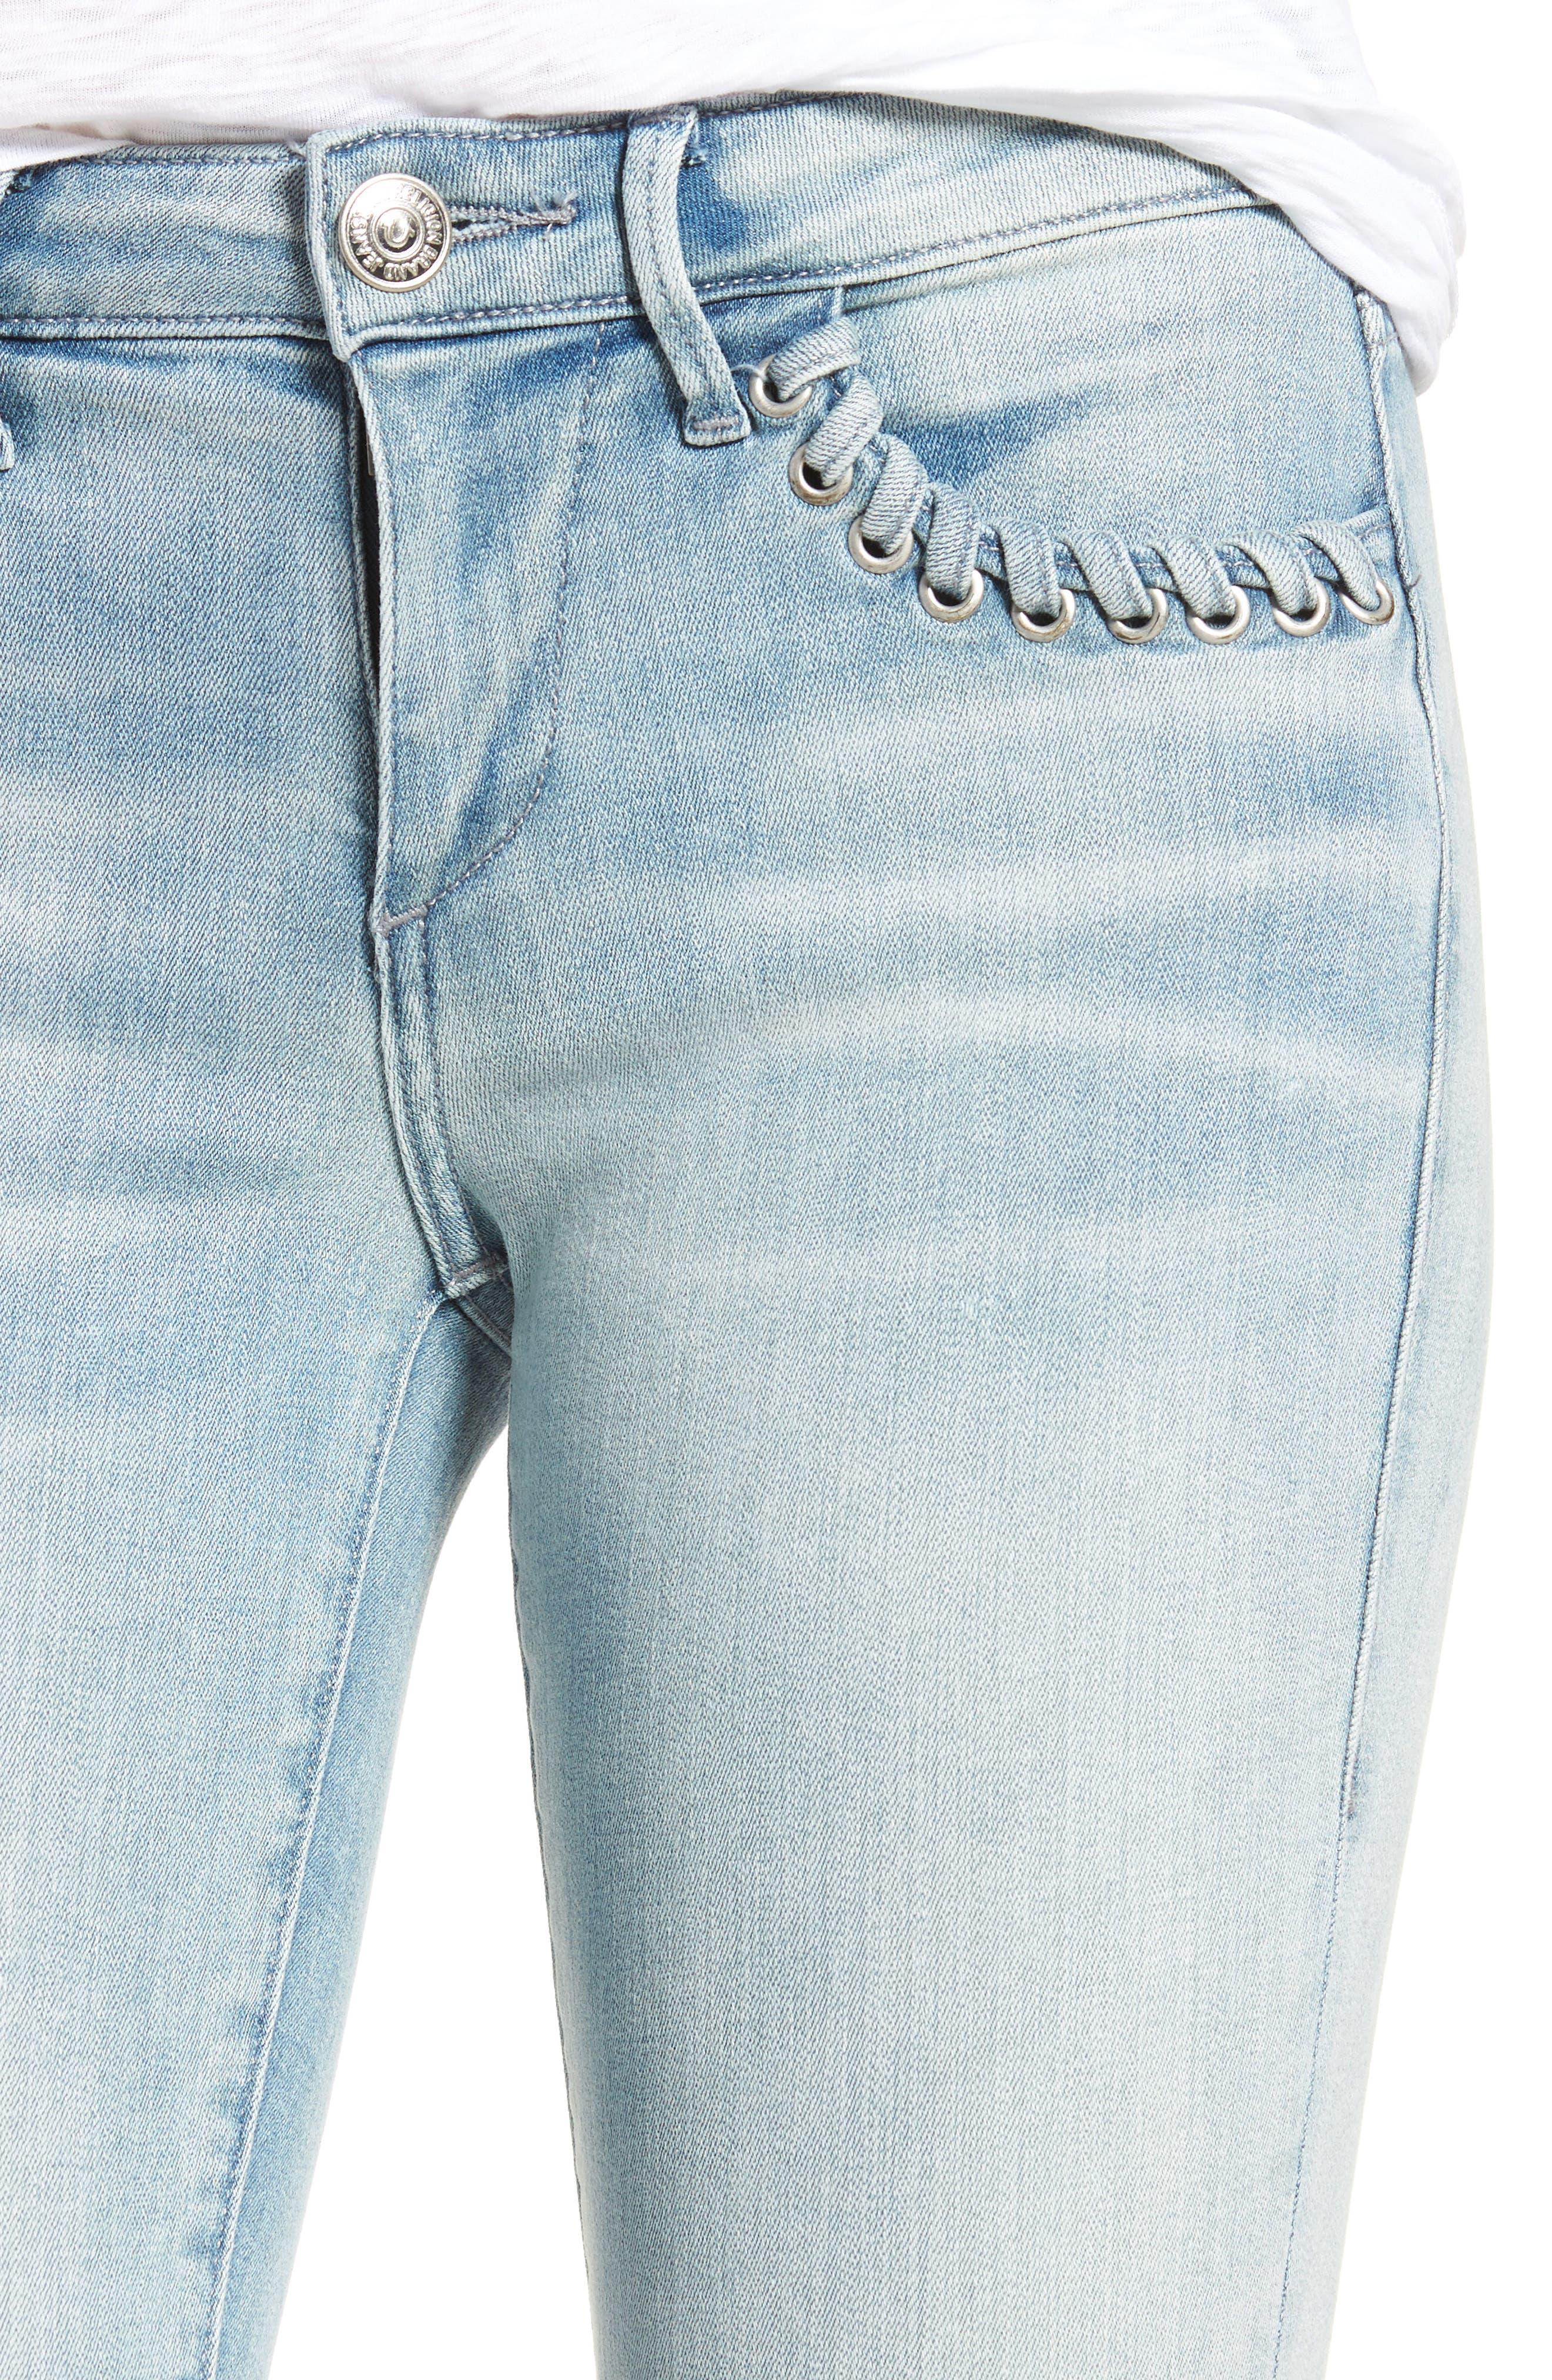 Halle Super Skinny Jeans,                             Alternate thumbnail 4, color,                             Cloud Nine